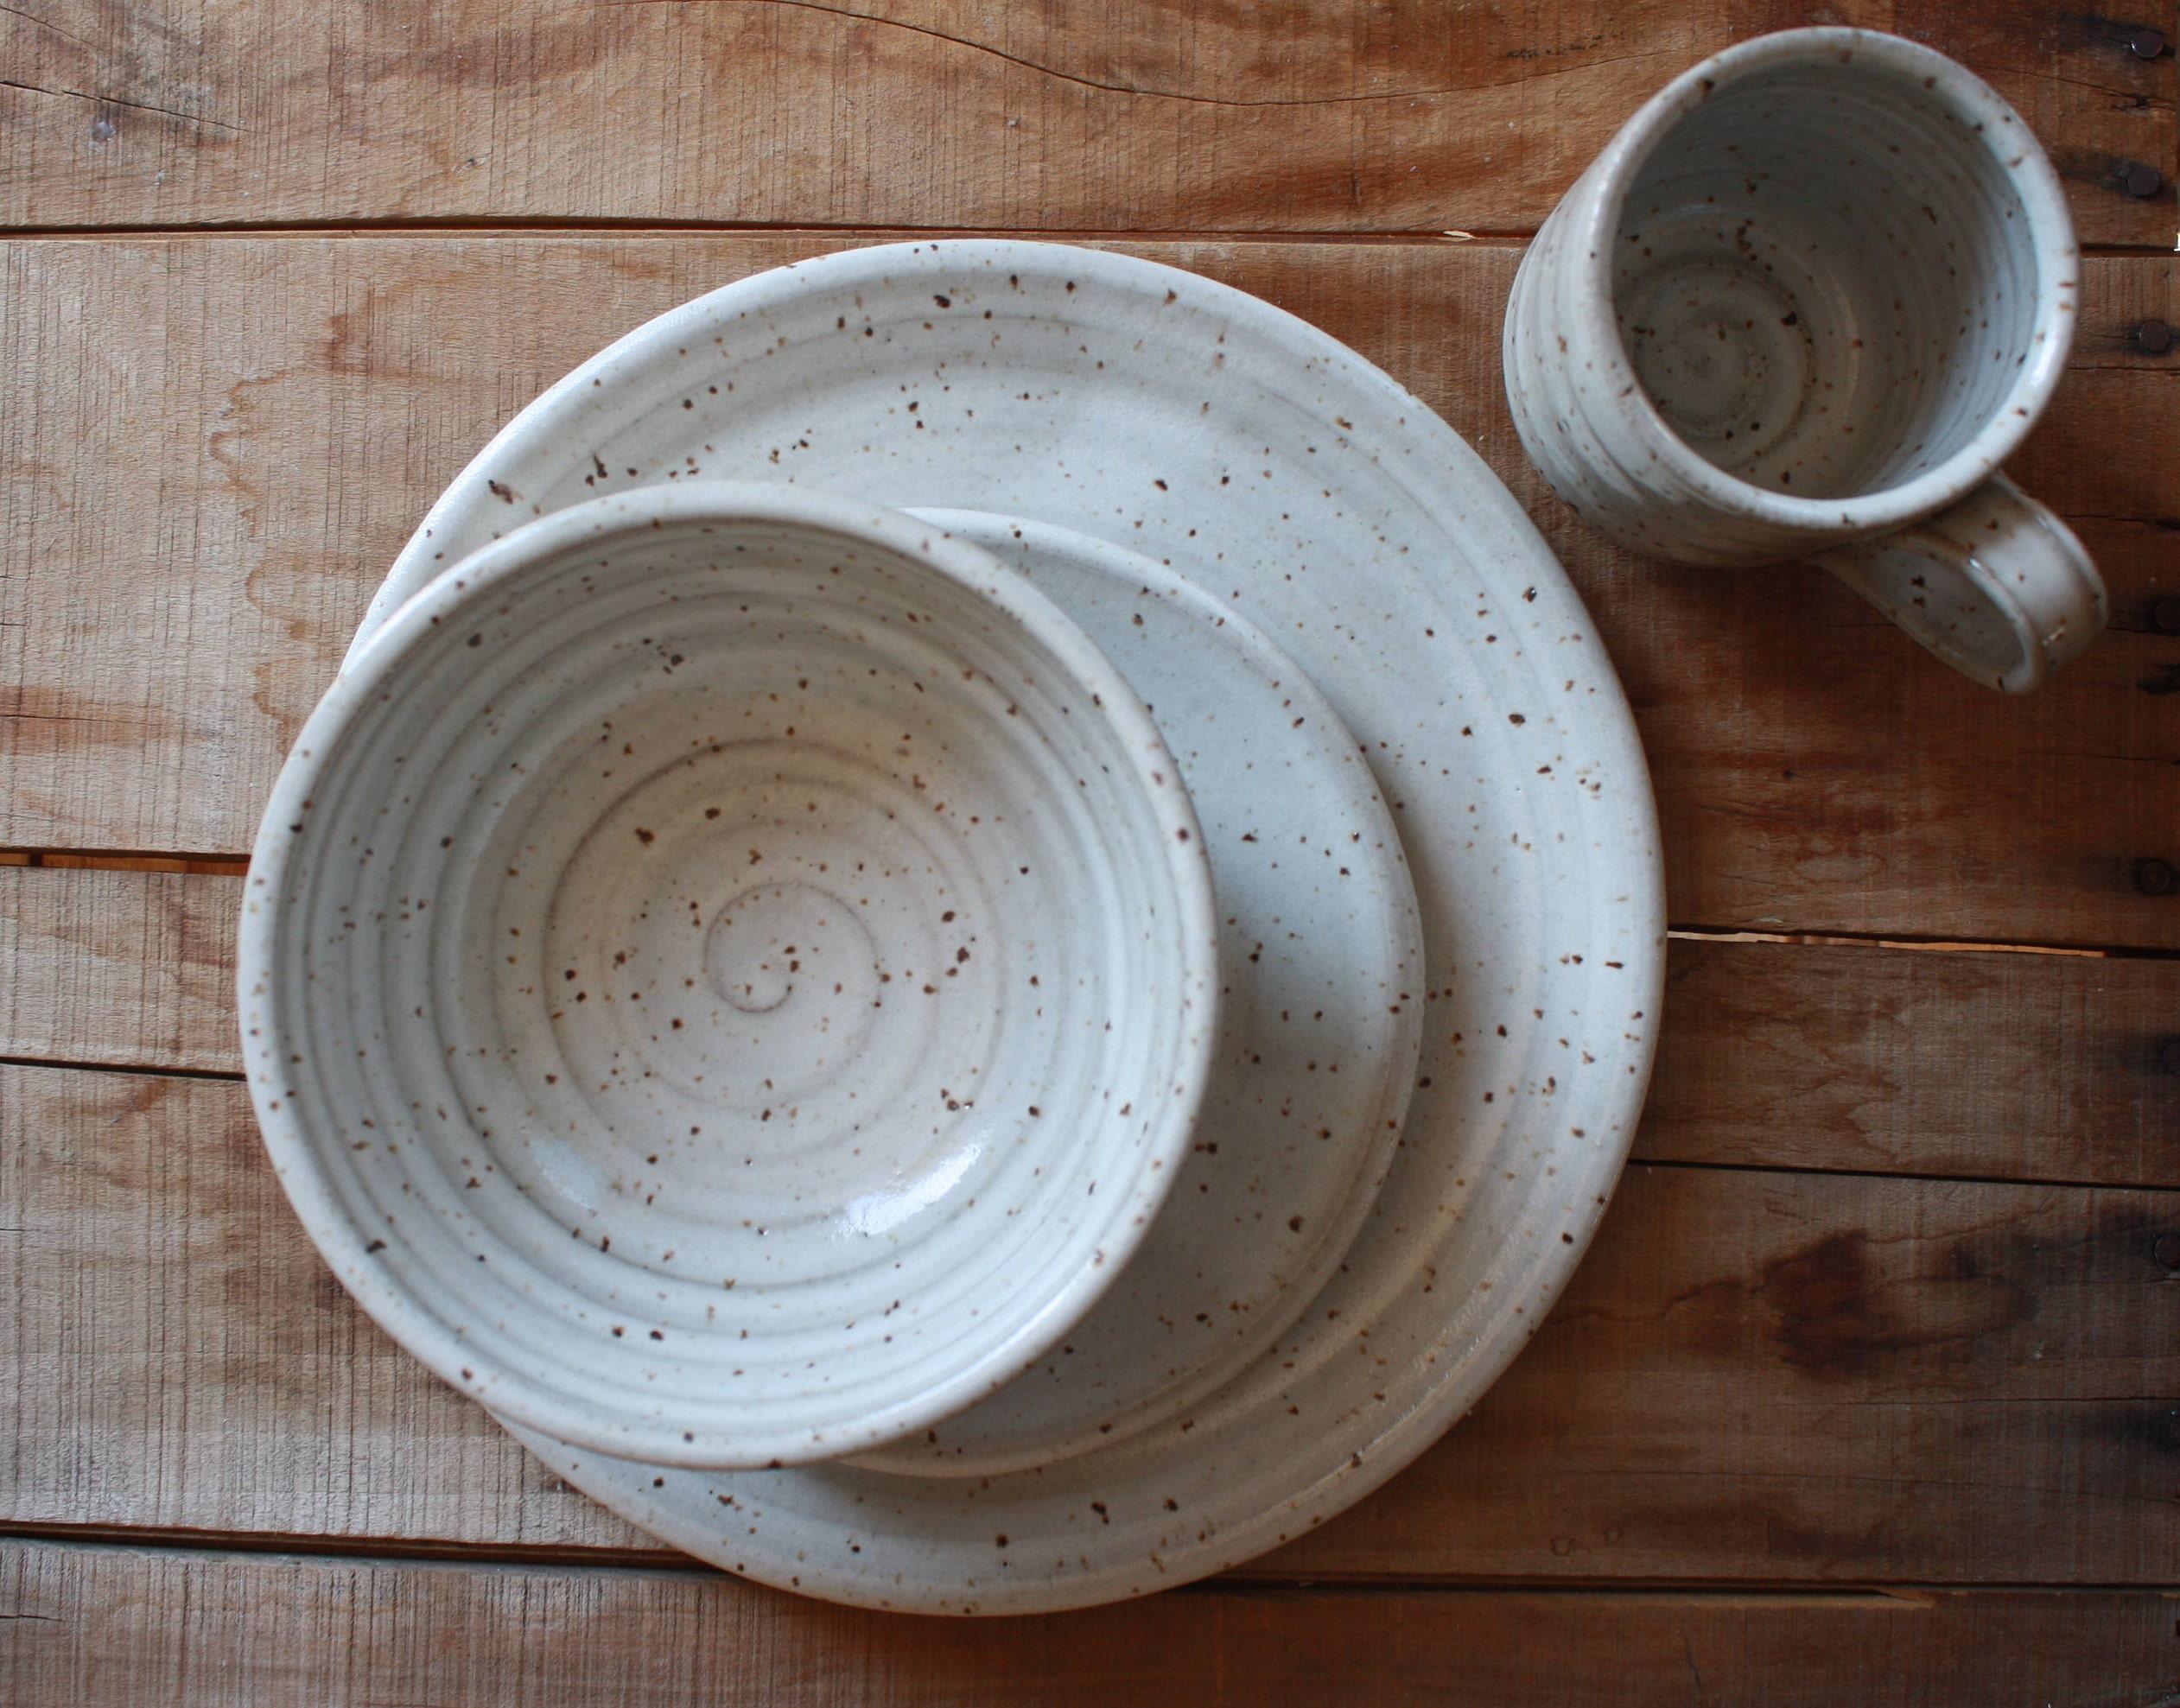 Dinner Ware Set - Four Piece Set - Dinner Plate - Salad Plate - Bowl - Mug - Handmade - Ceramics \u0026 Pottery - KJ Pottery & Dinner Ware Set - Four Piece Set - Dinner Plate - Salad Plate - Bowl ...